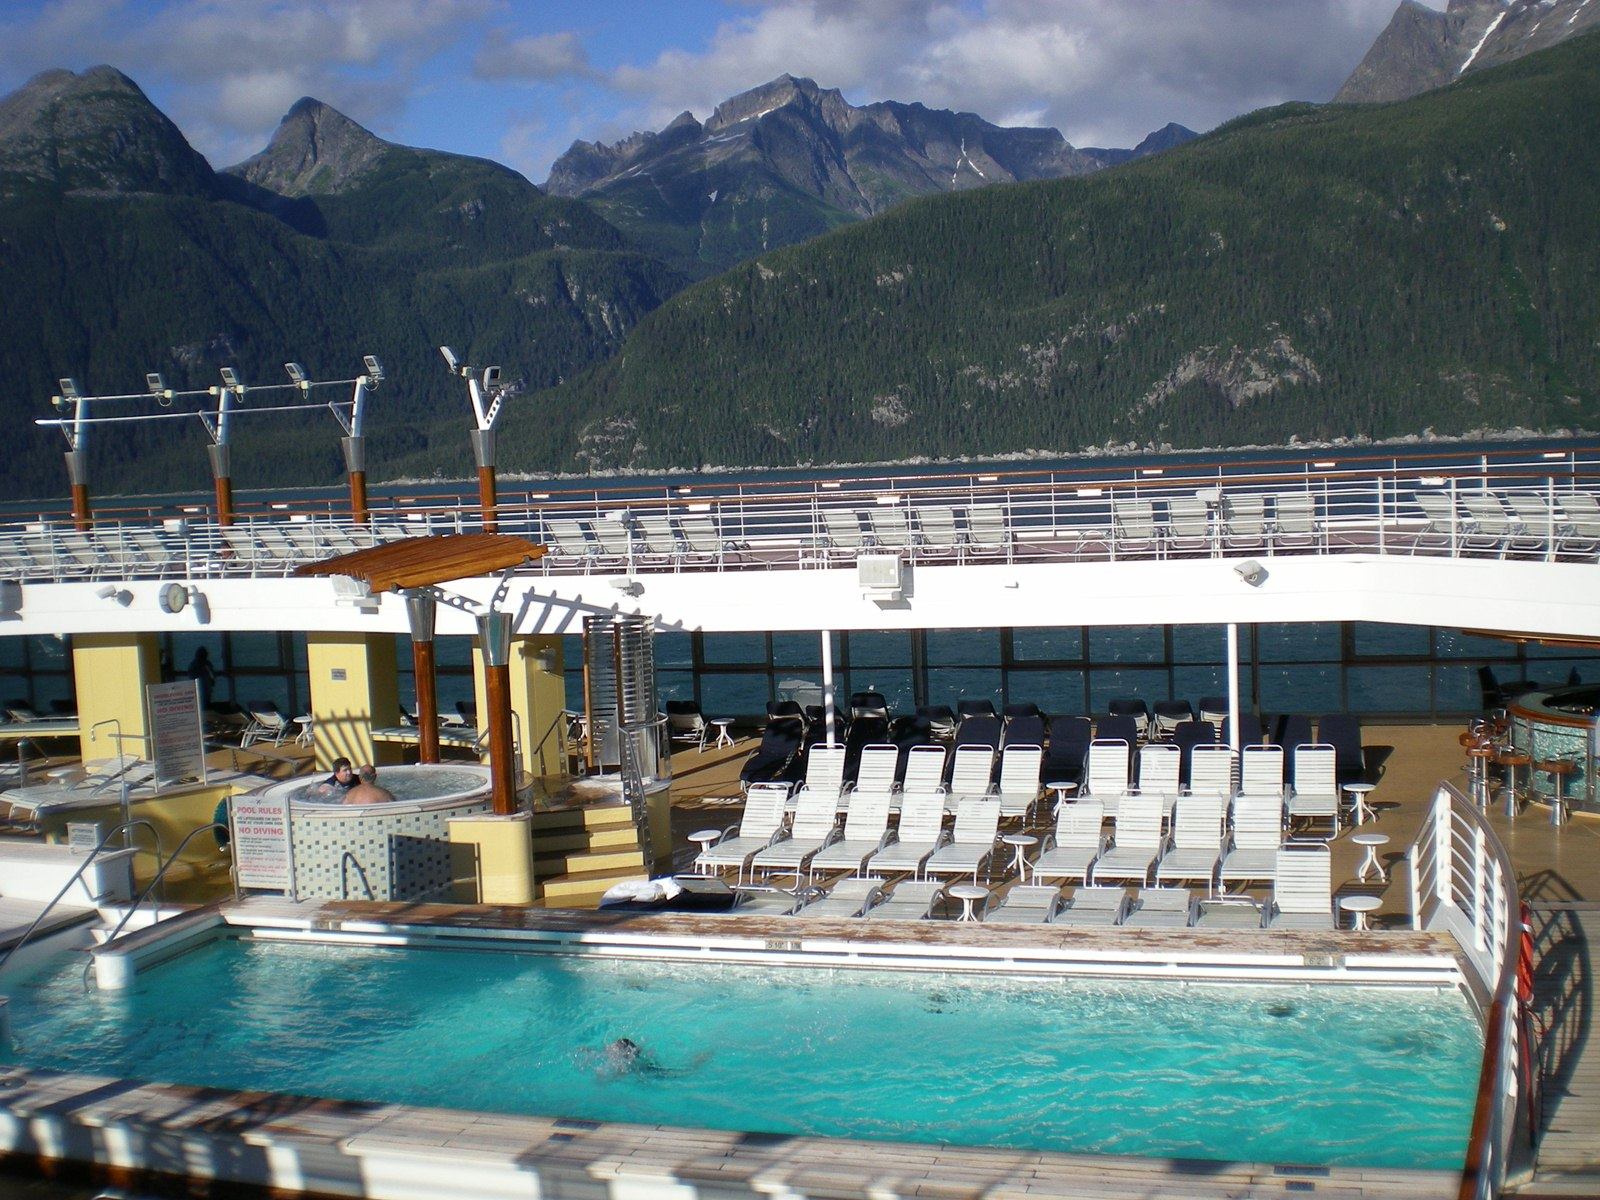 Mobiles Schwimmbad Vor Grandioser Kulisse